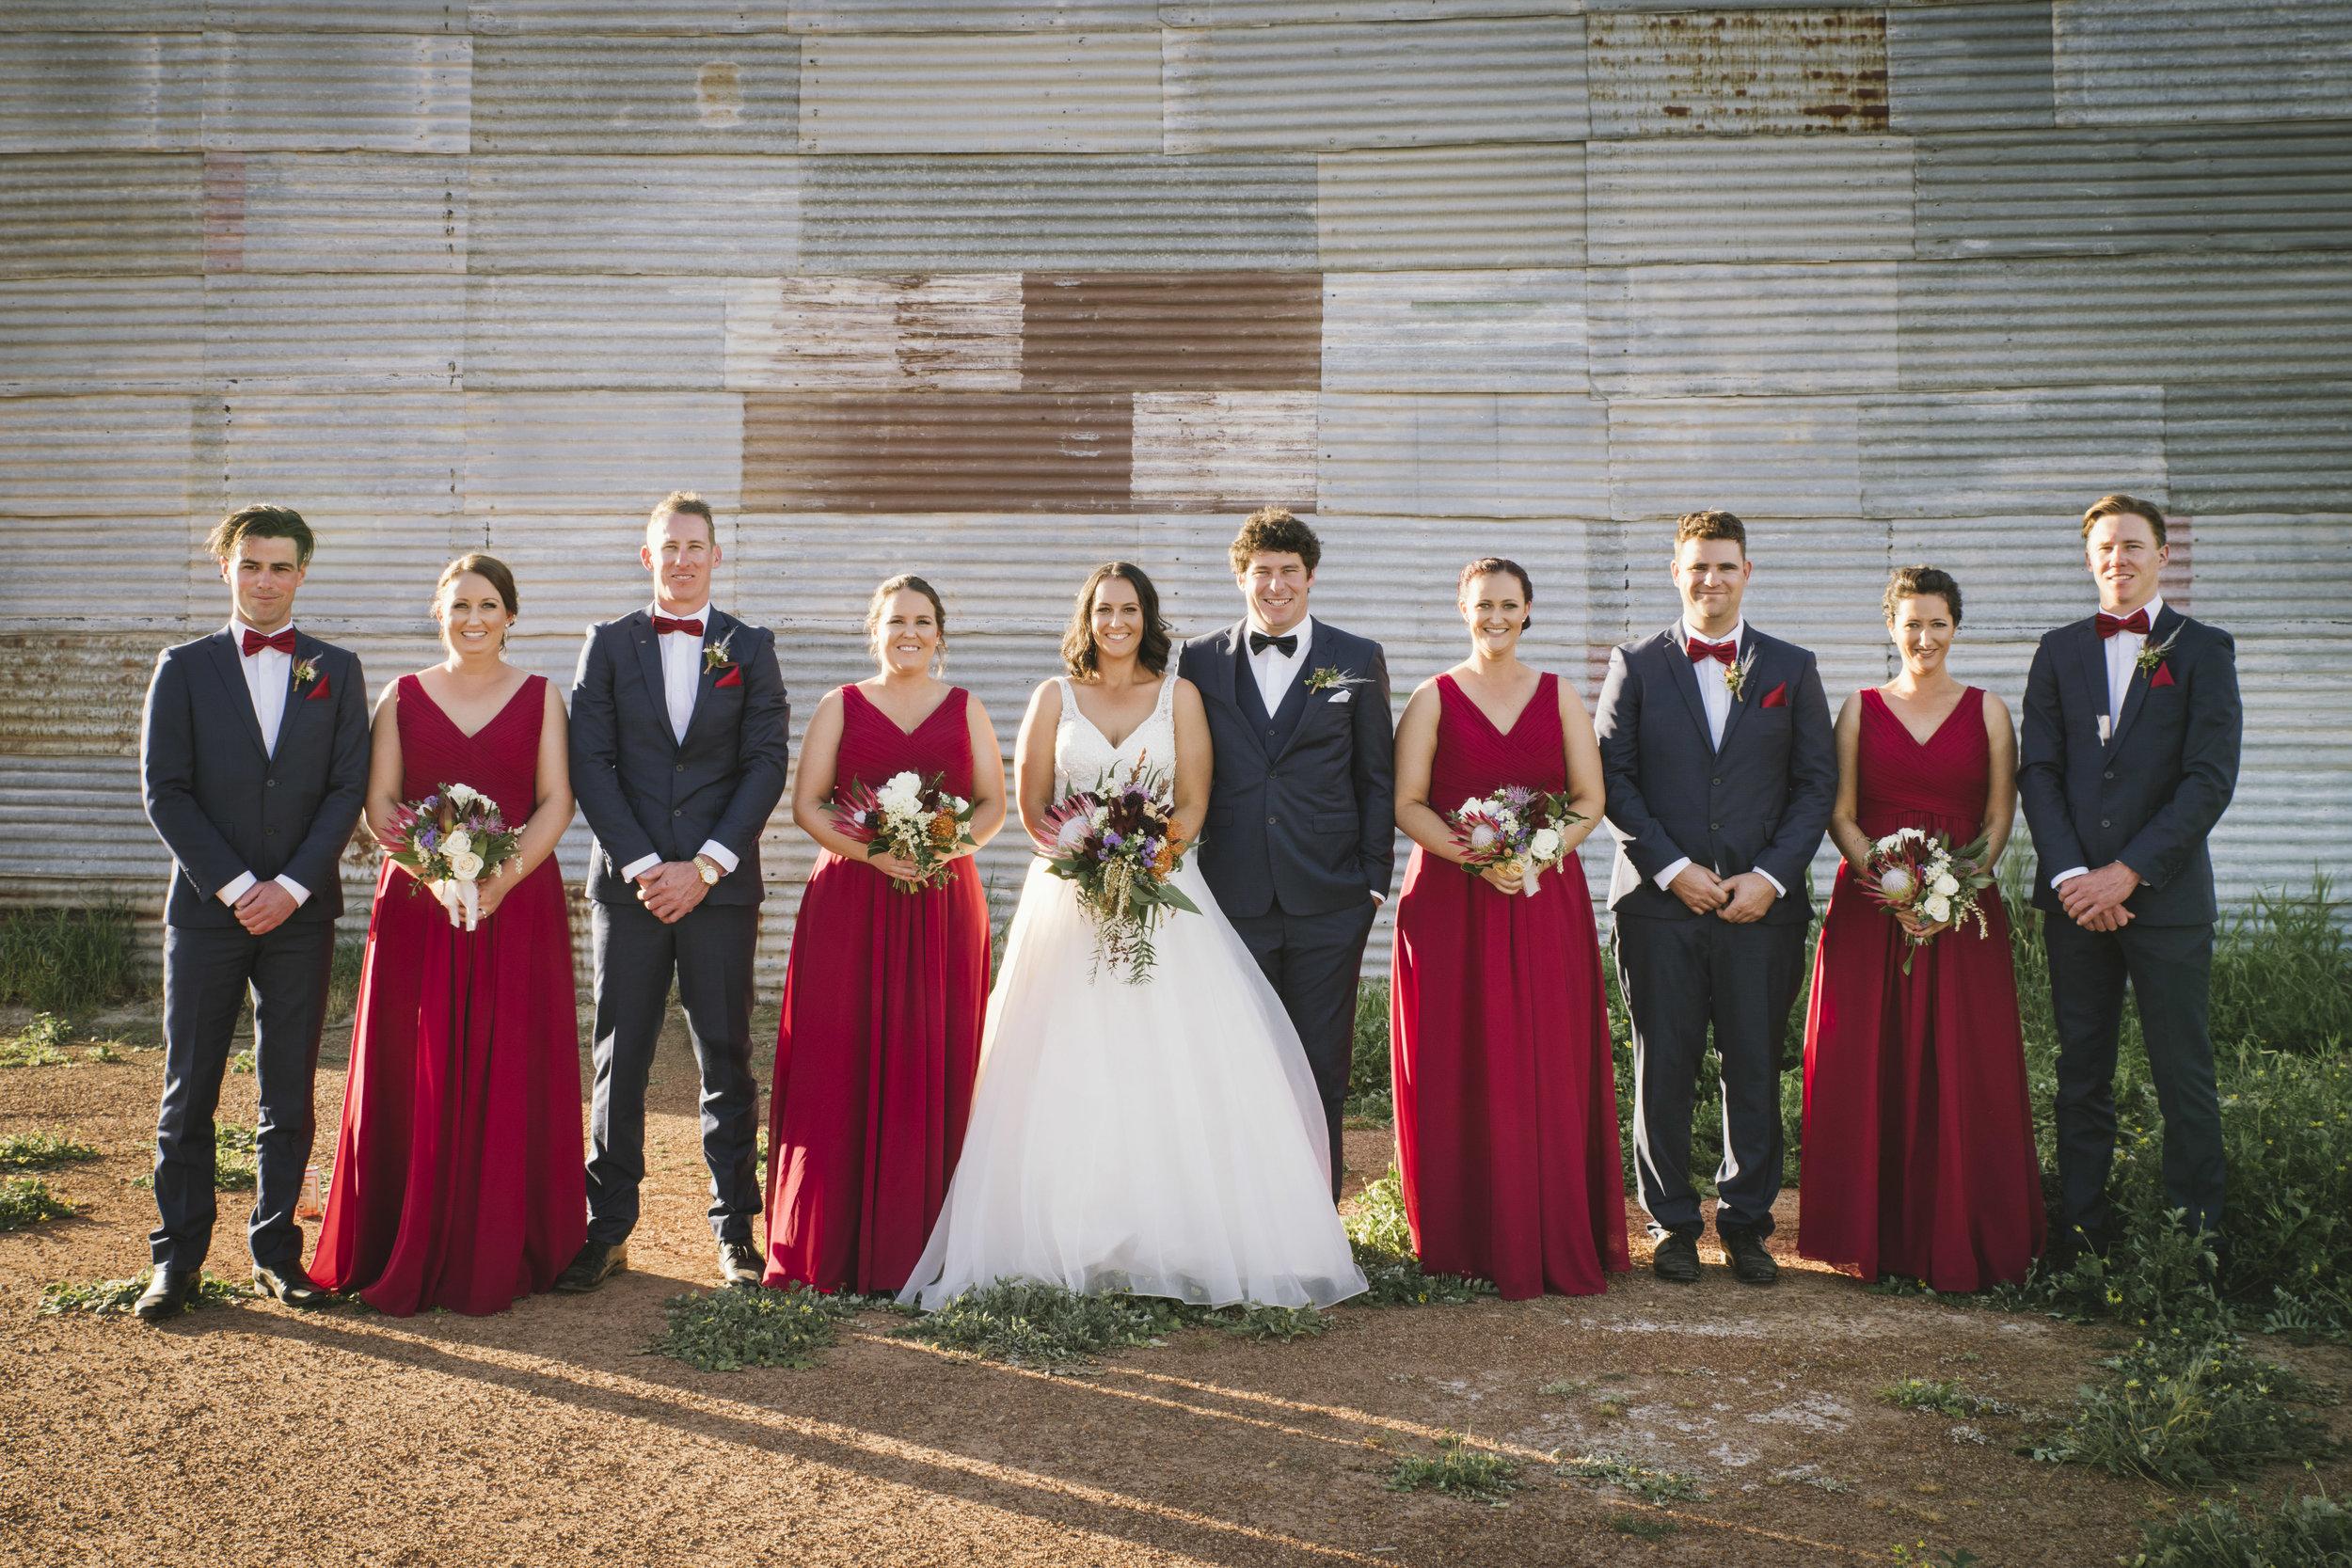 Angie Roe Photography Wheatbelt Avon Valley Farm Wedding (44).jpg